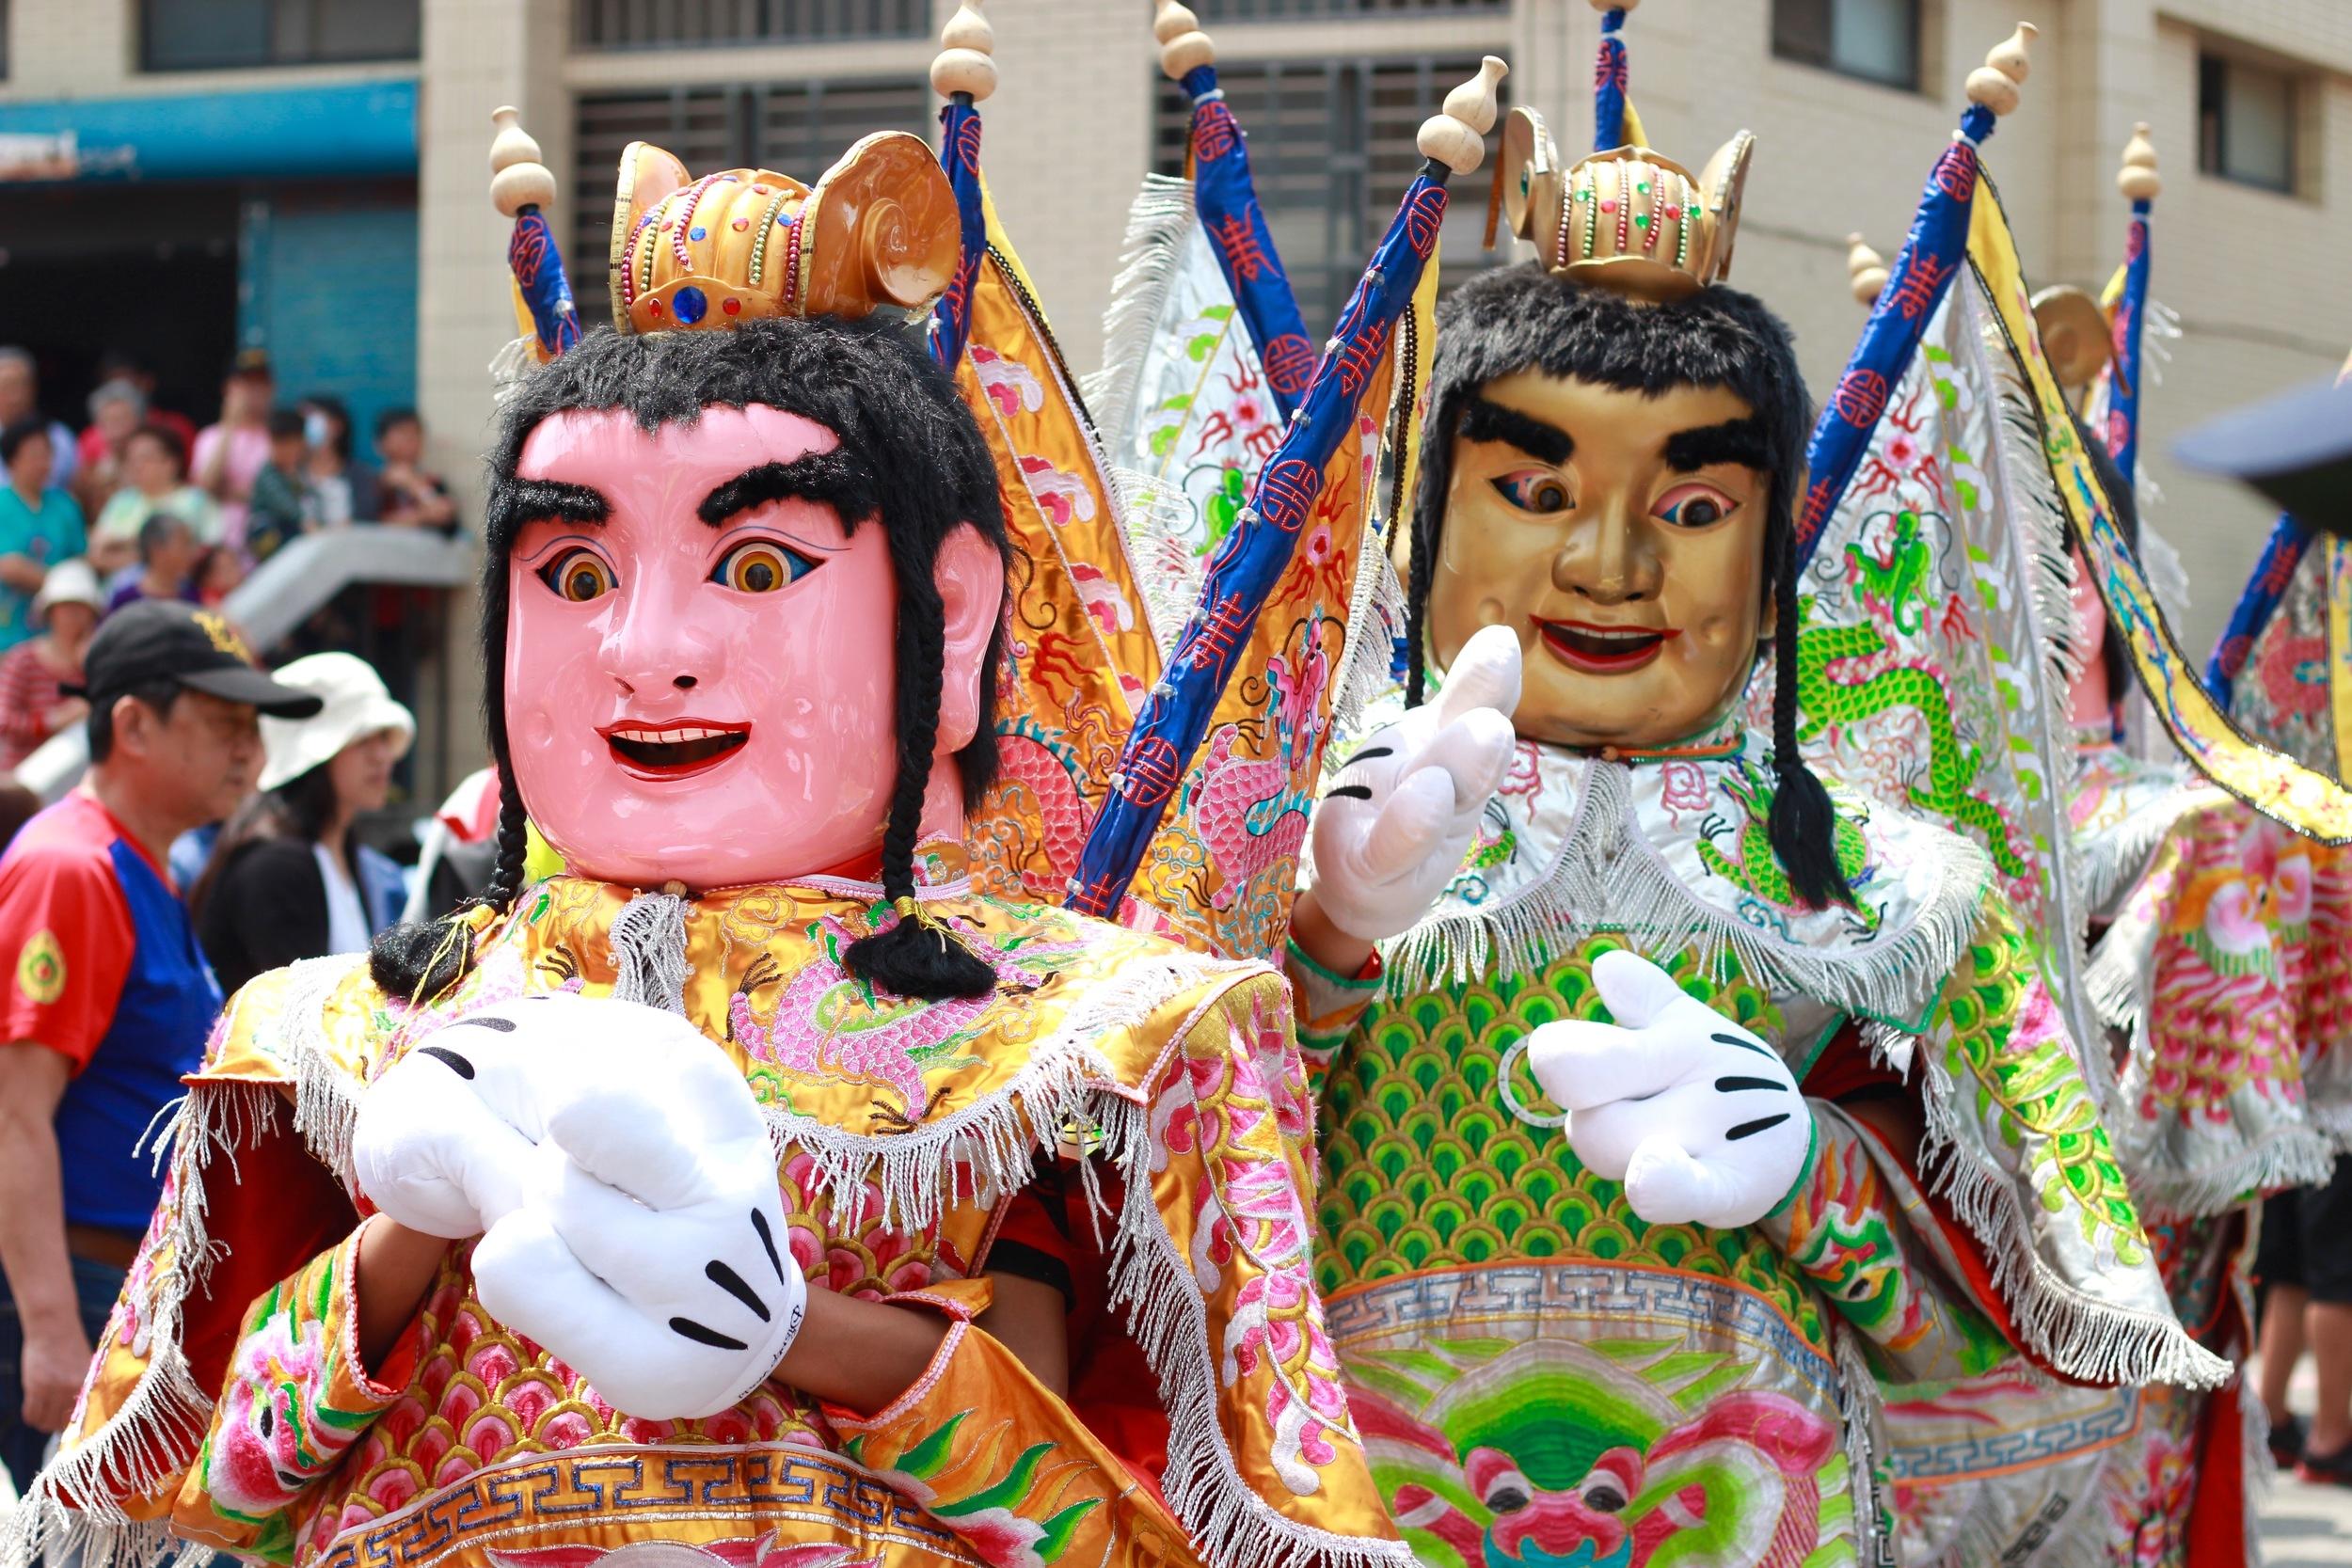 Kinmen's biggest festival, the Cheng Huang Island God Parade